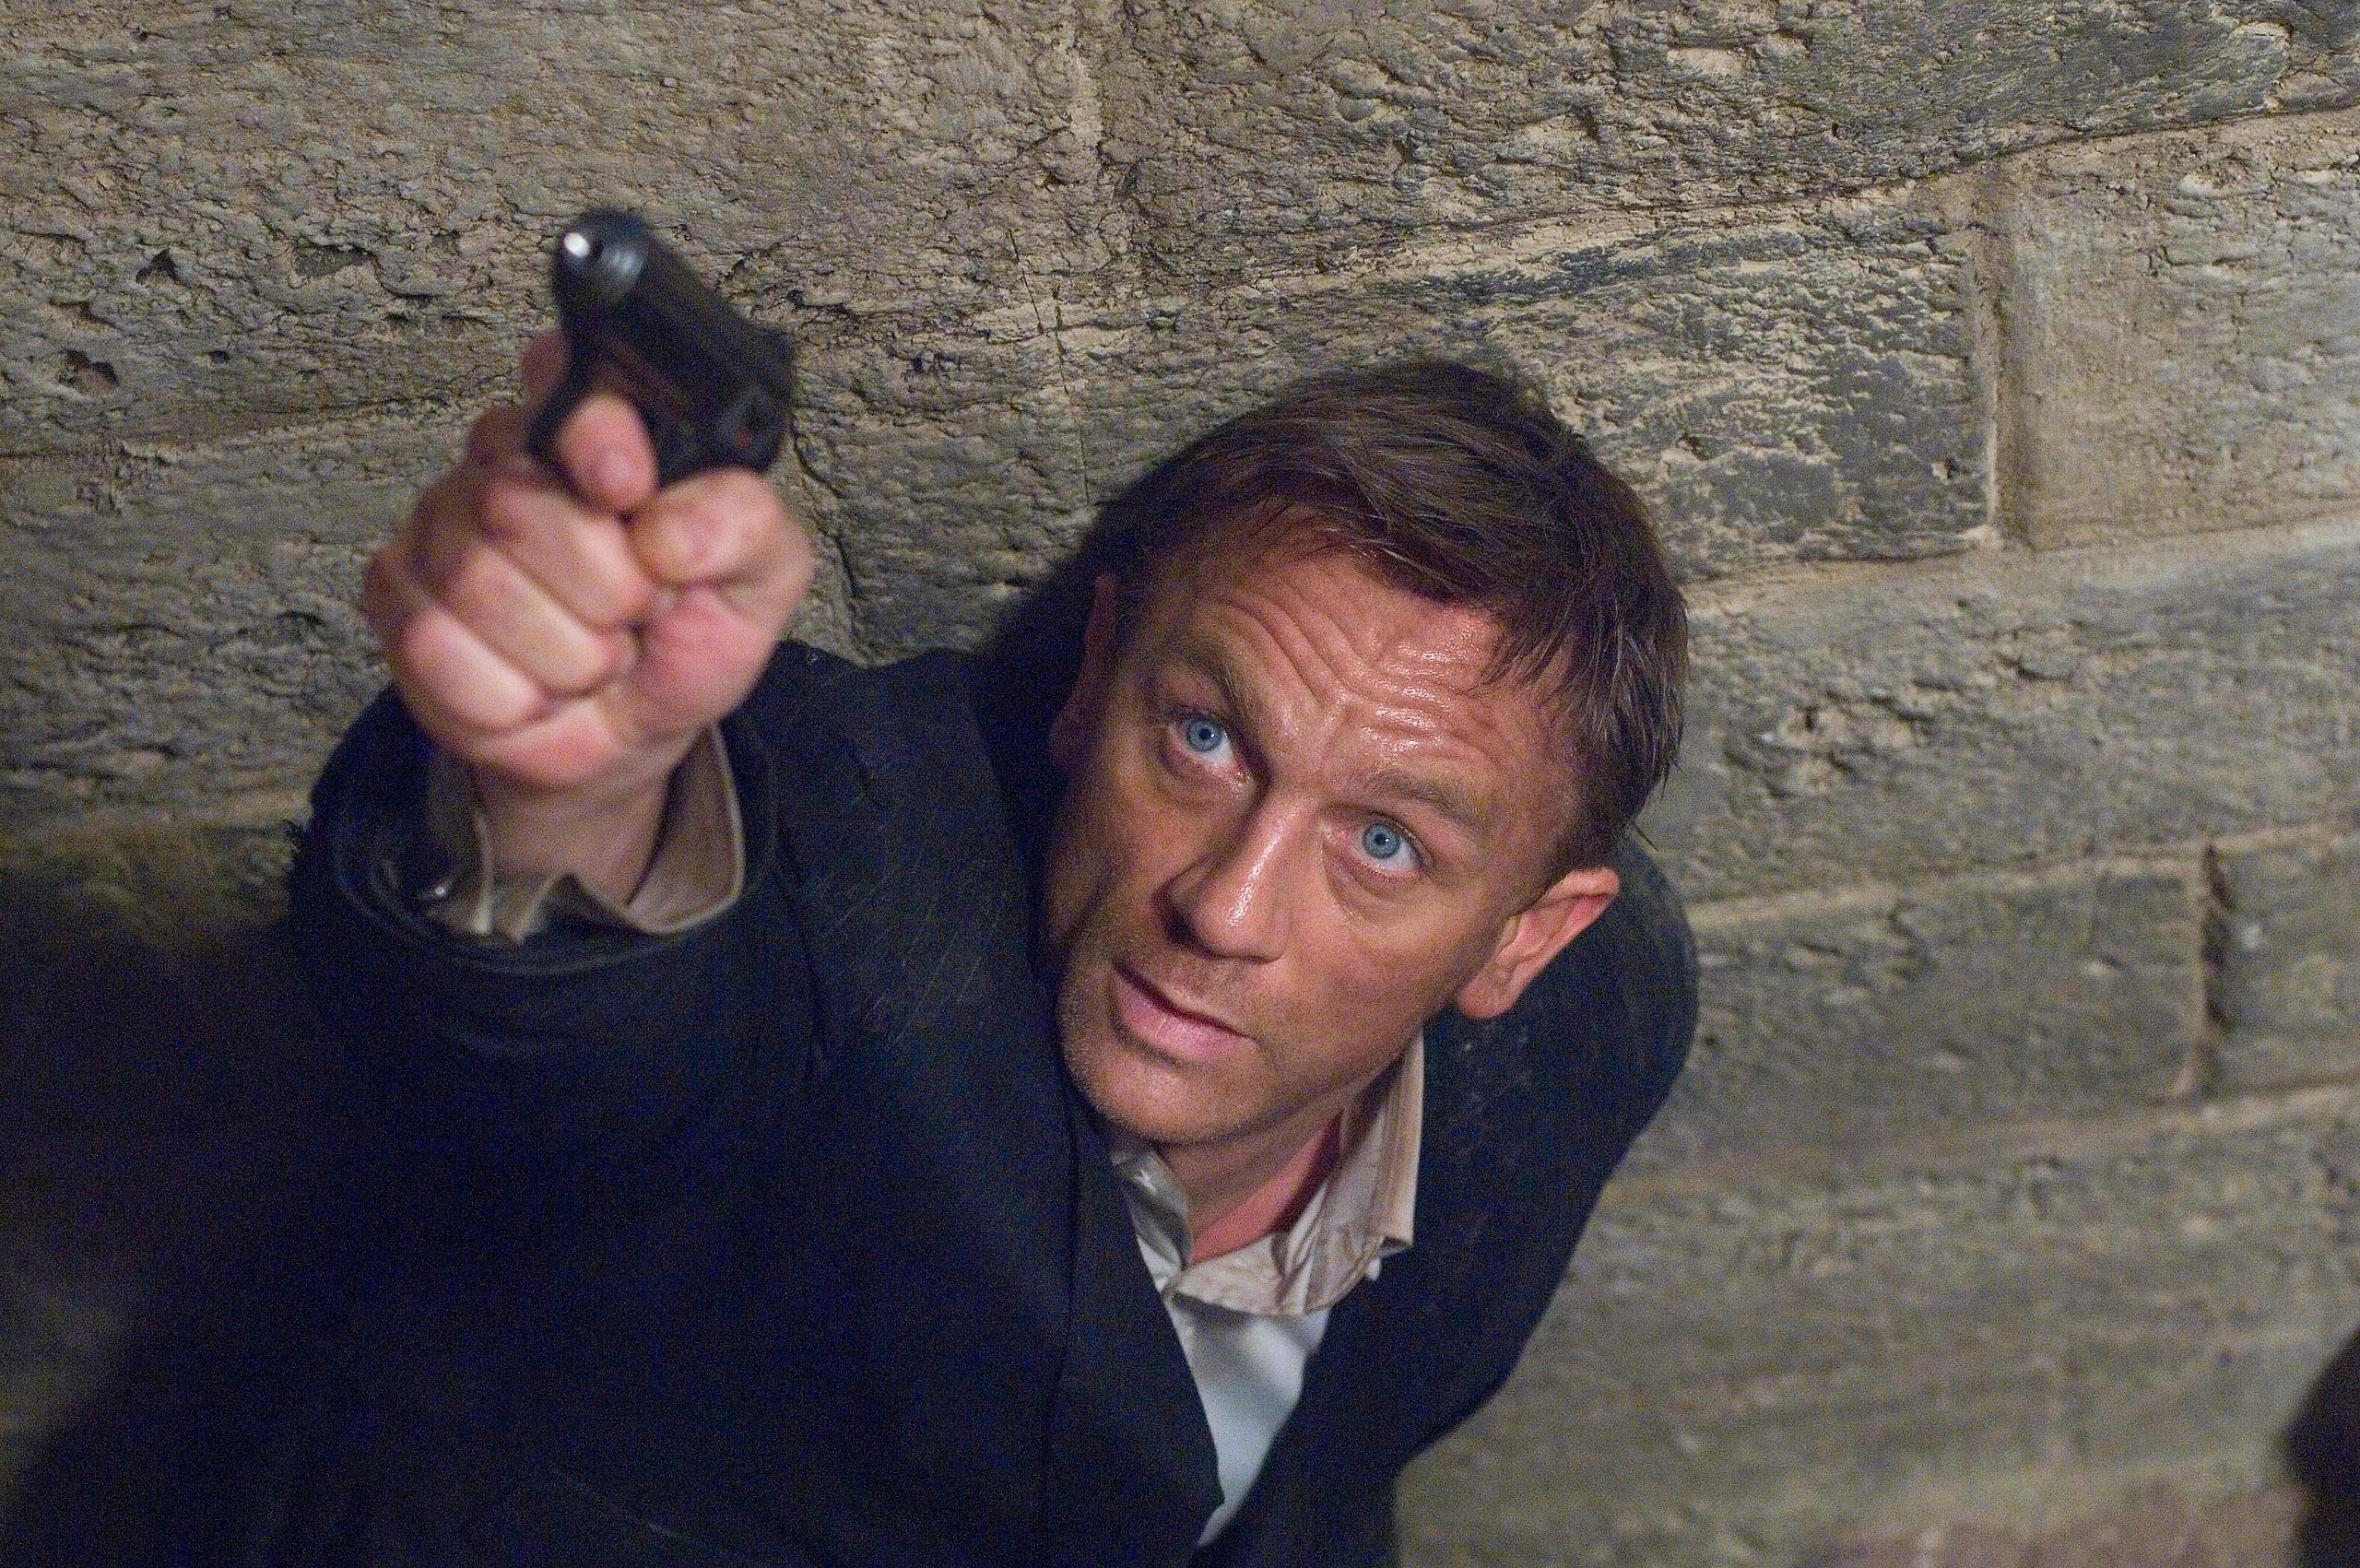 <strong><i>Quantum of Solace</i> (2008) - Daniel Craig</strong>